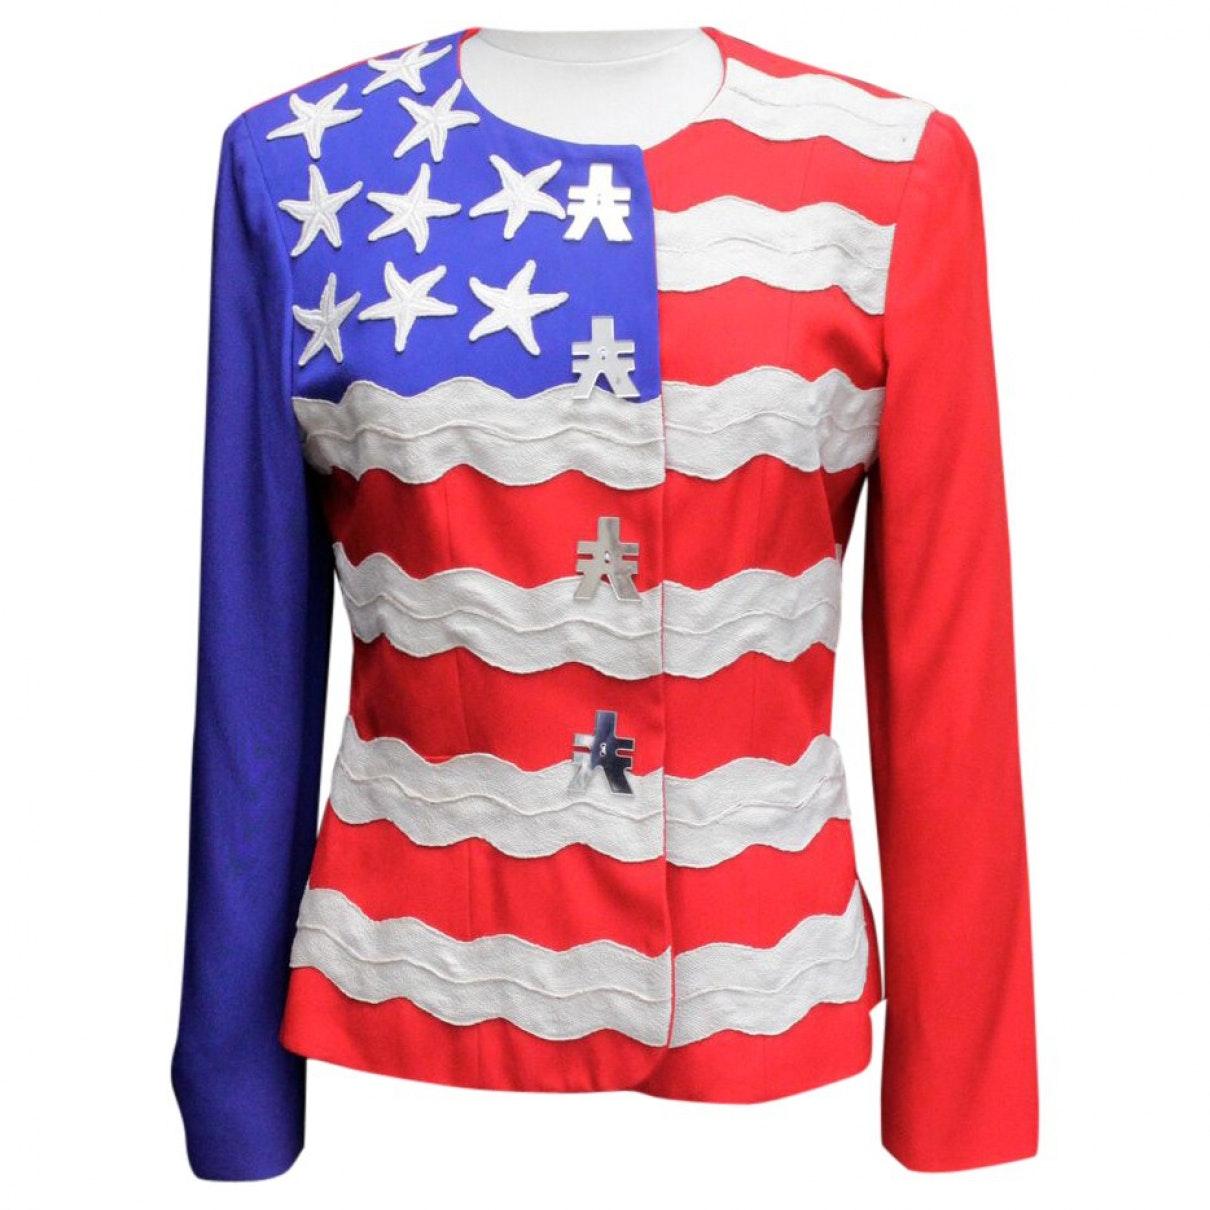 MOSCHINO Jacket; Size: 38 FR; $801.52